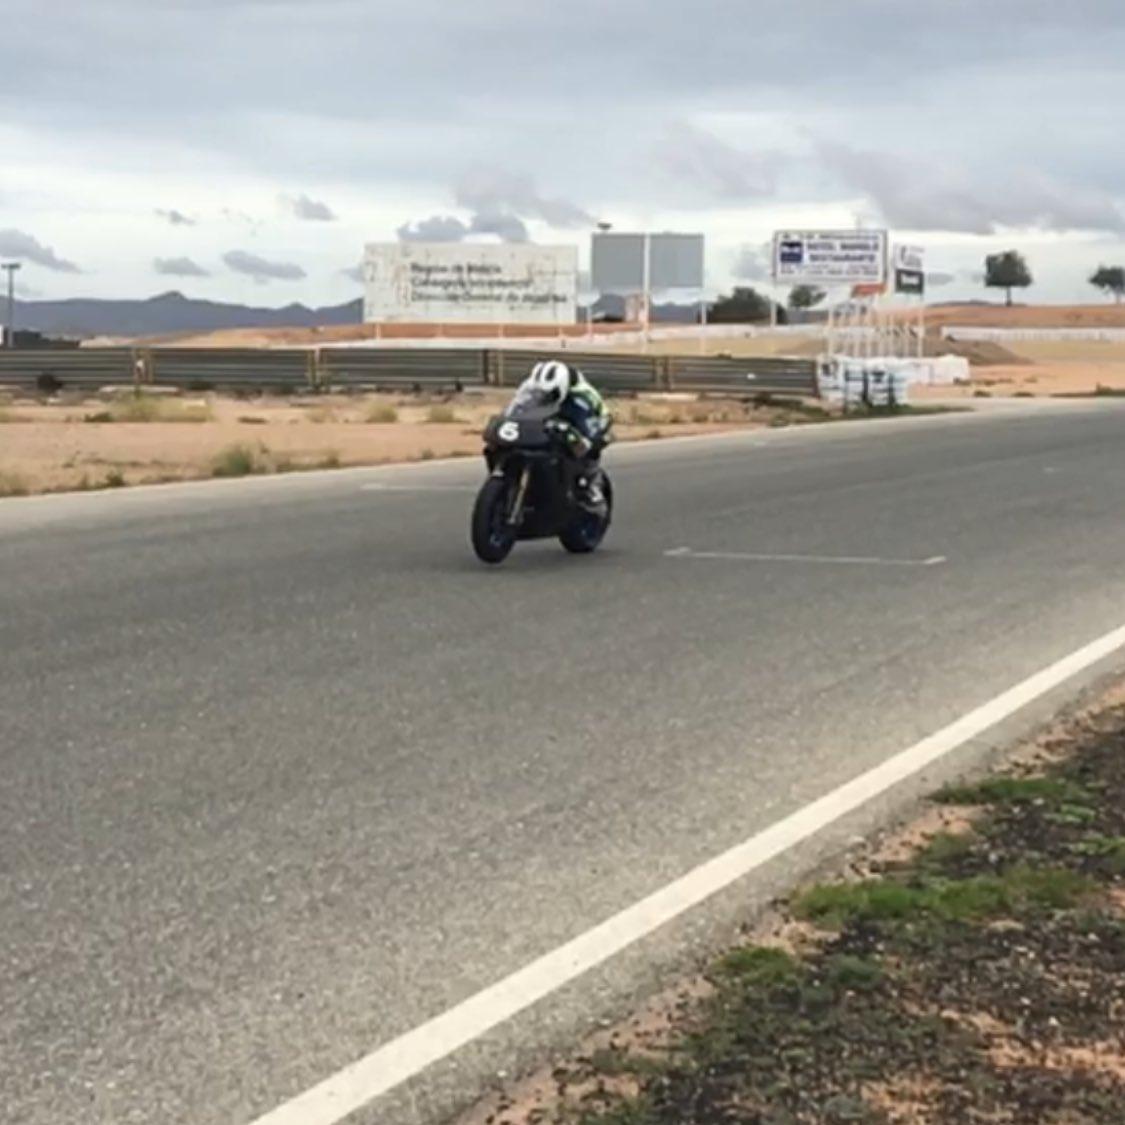 [Road racing] Saison 2018 - Page 3 DXM1dLaXcAEDbFC